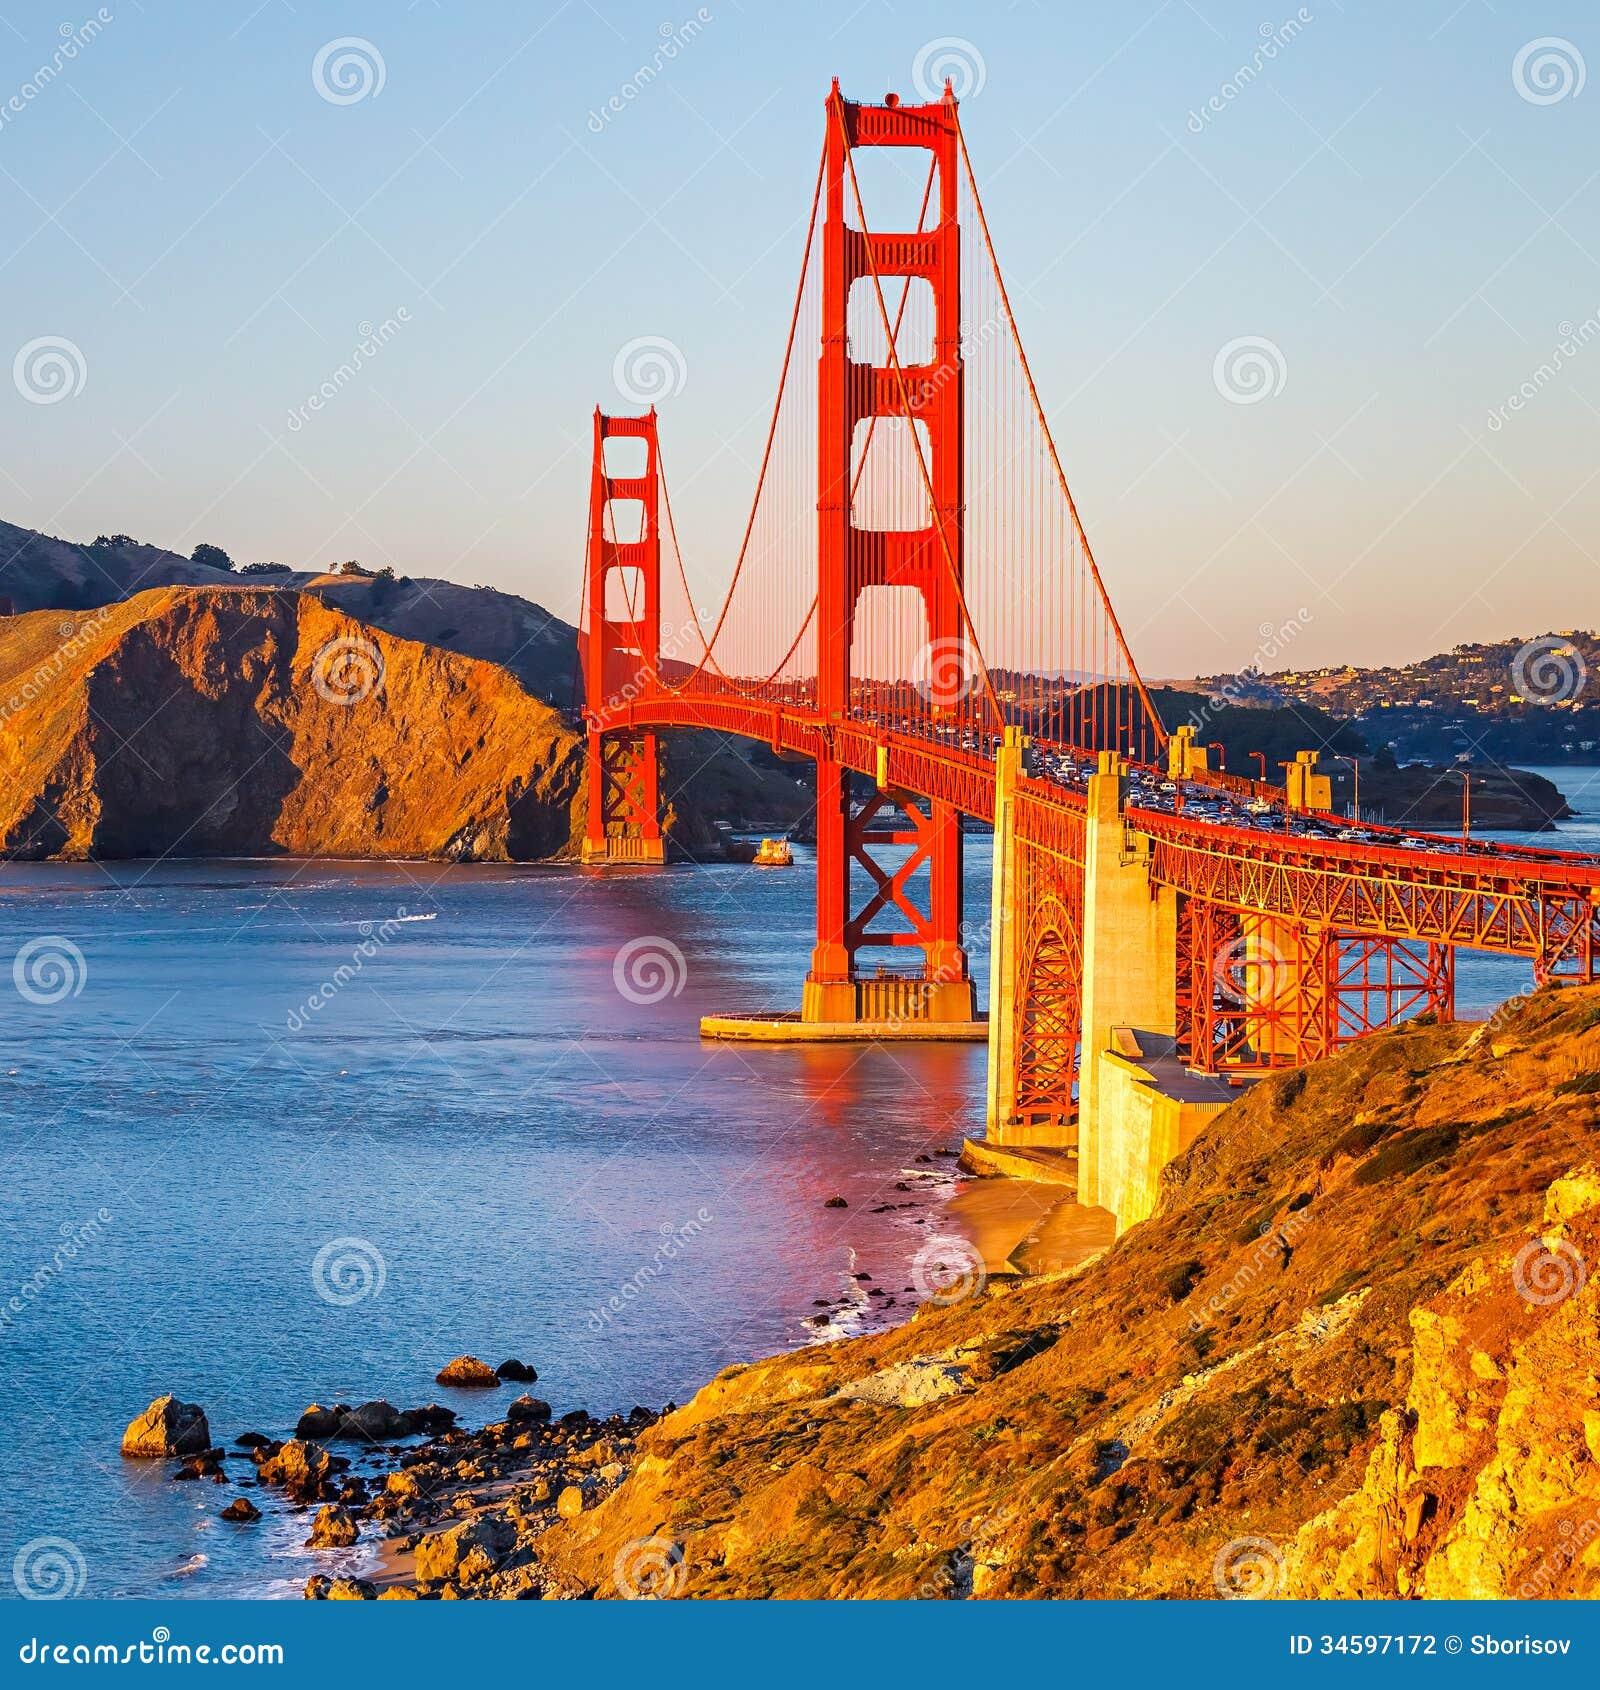 Golden Gate Bridge San Francisco California Sunset Picture: Golden Gate Bridge Stock Photo. Image Of Scene, Evening